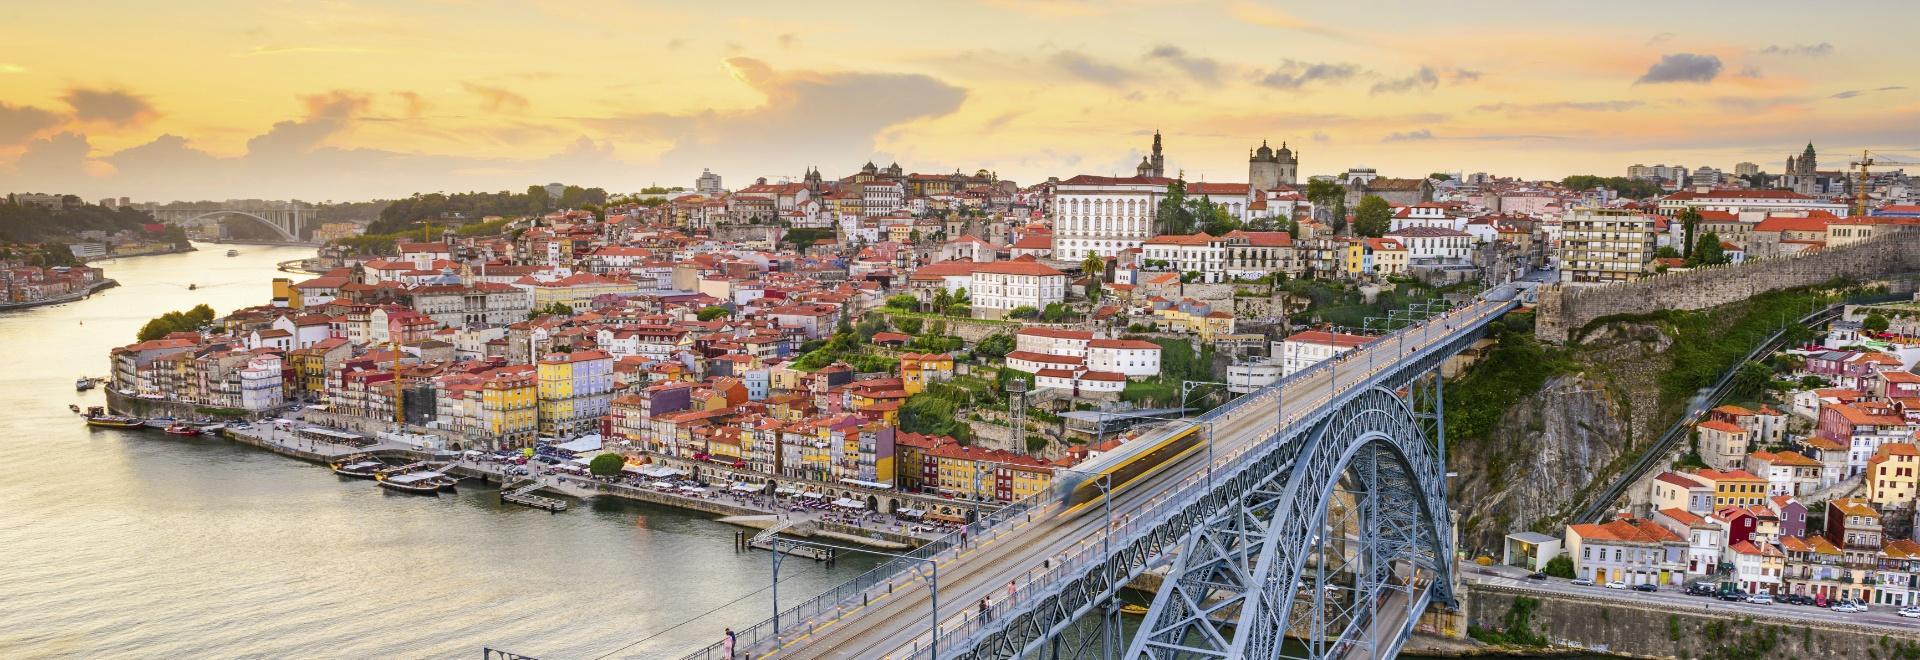 comprar iptv portugal